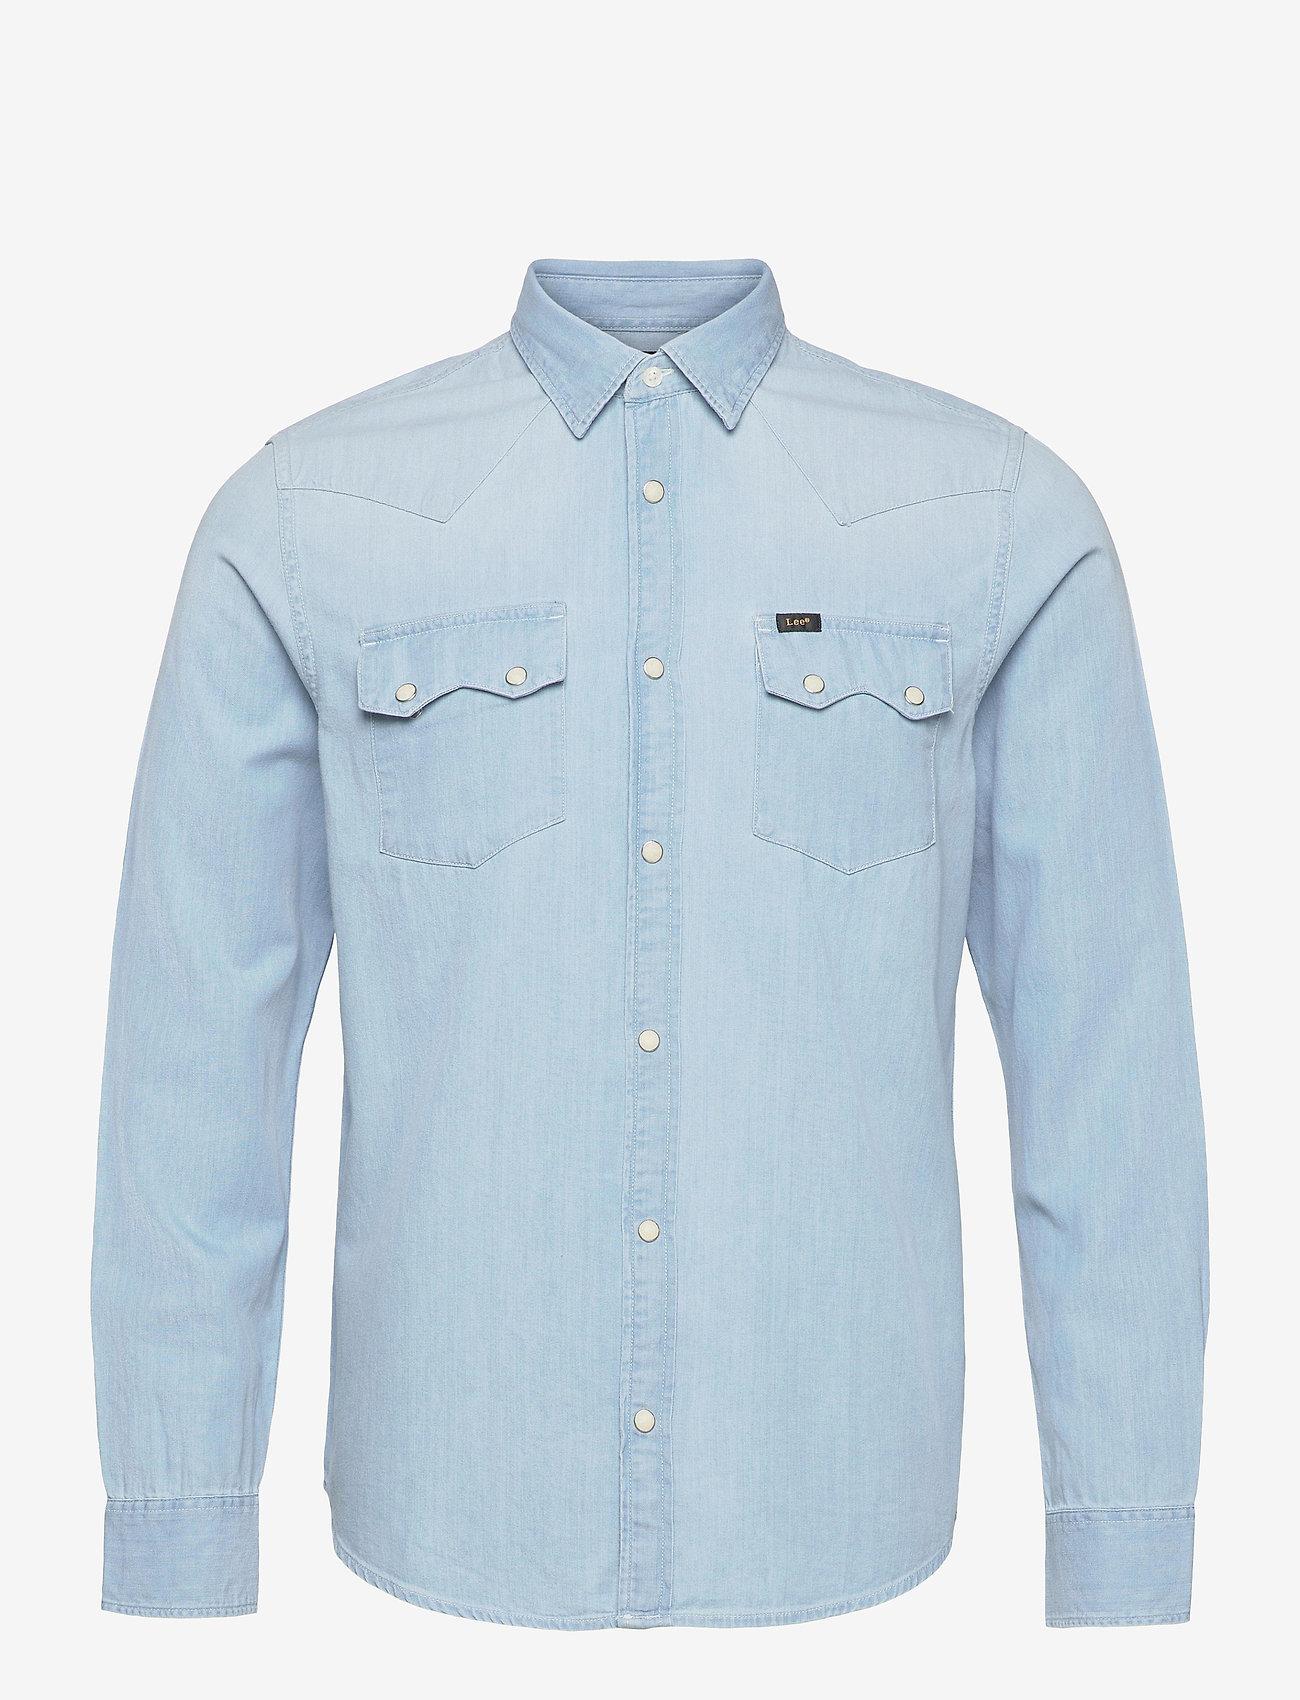 Lee Jeans - LEE RIDER SHIRT - basic shirts - summer blue - 0